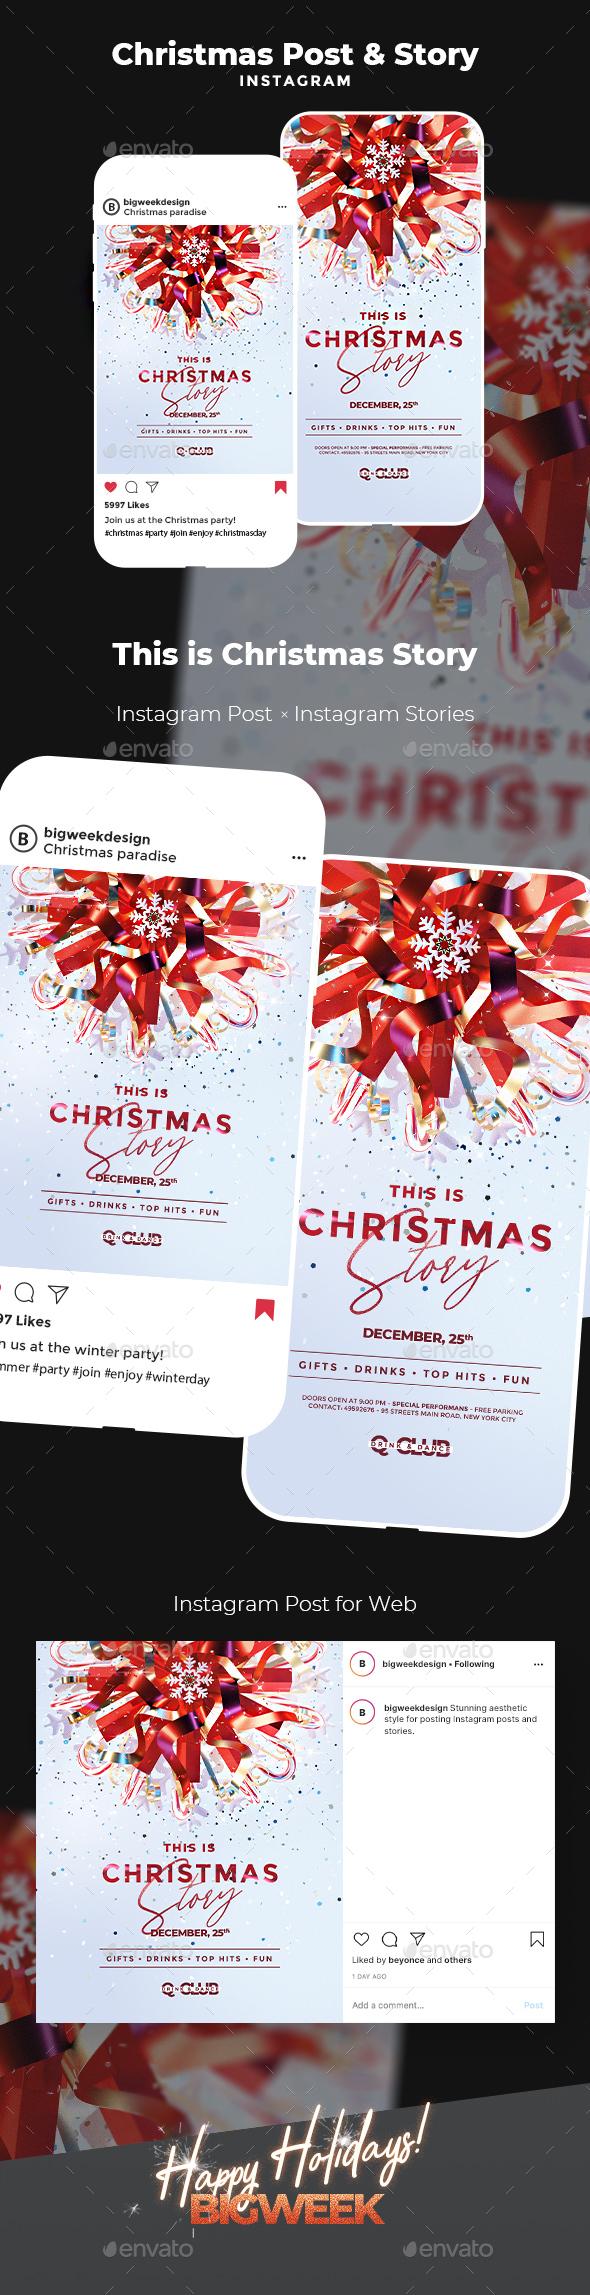 Christmas Instagram Templates